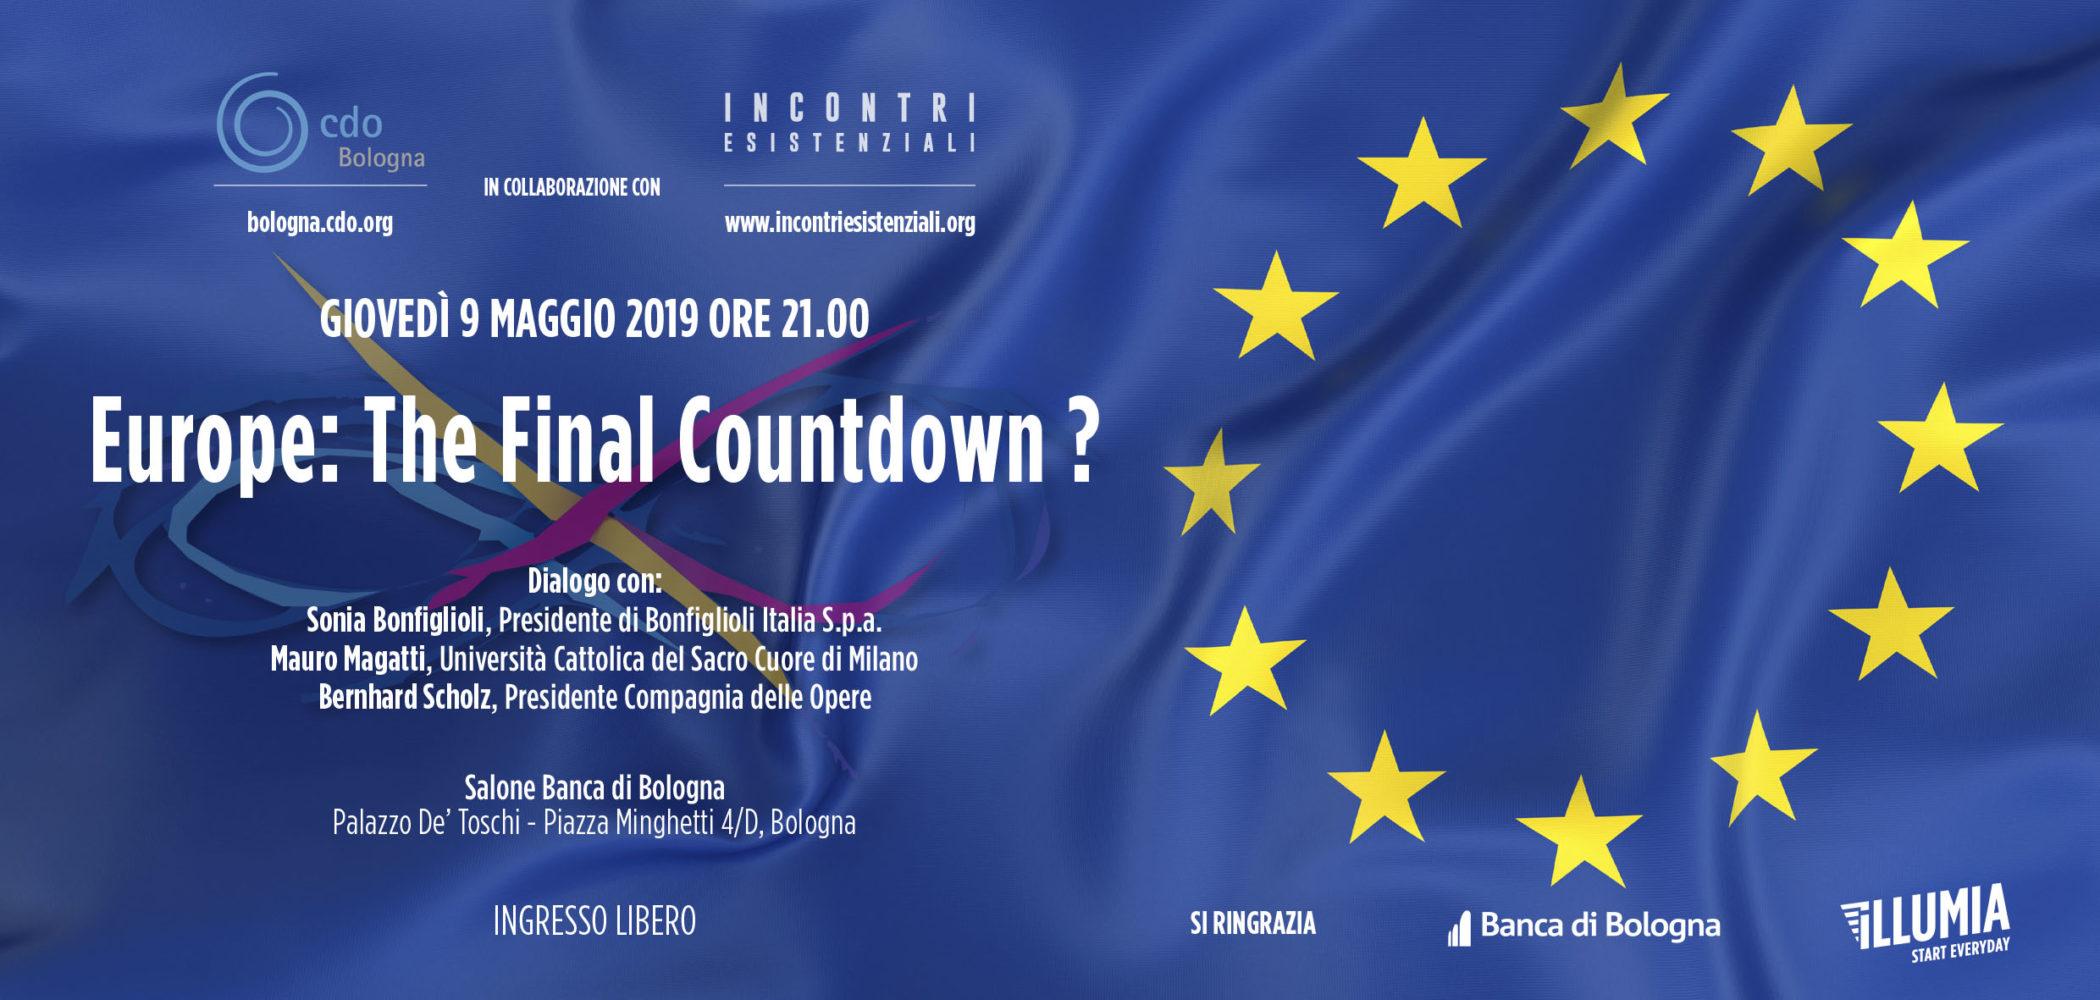 Europe: The Final Countdown